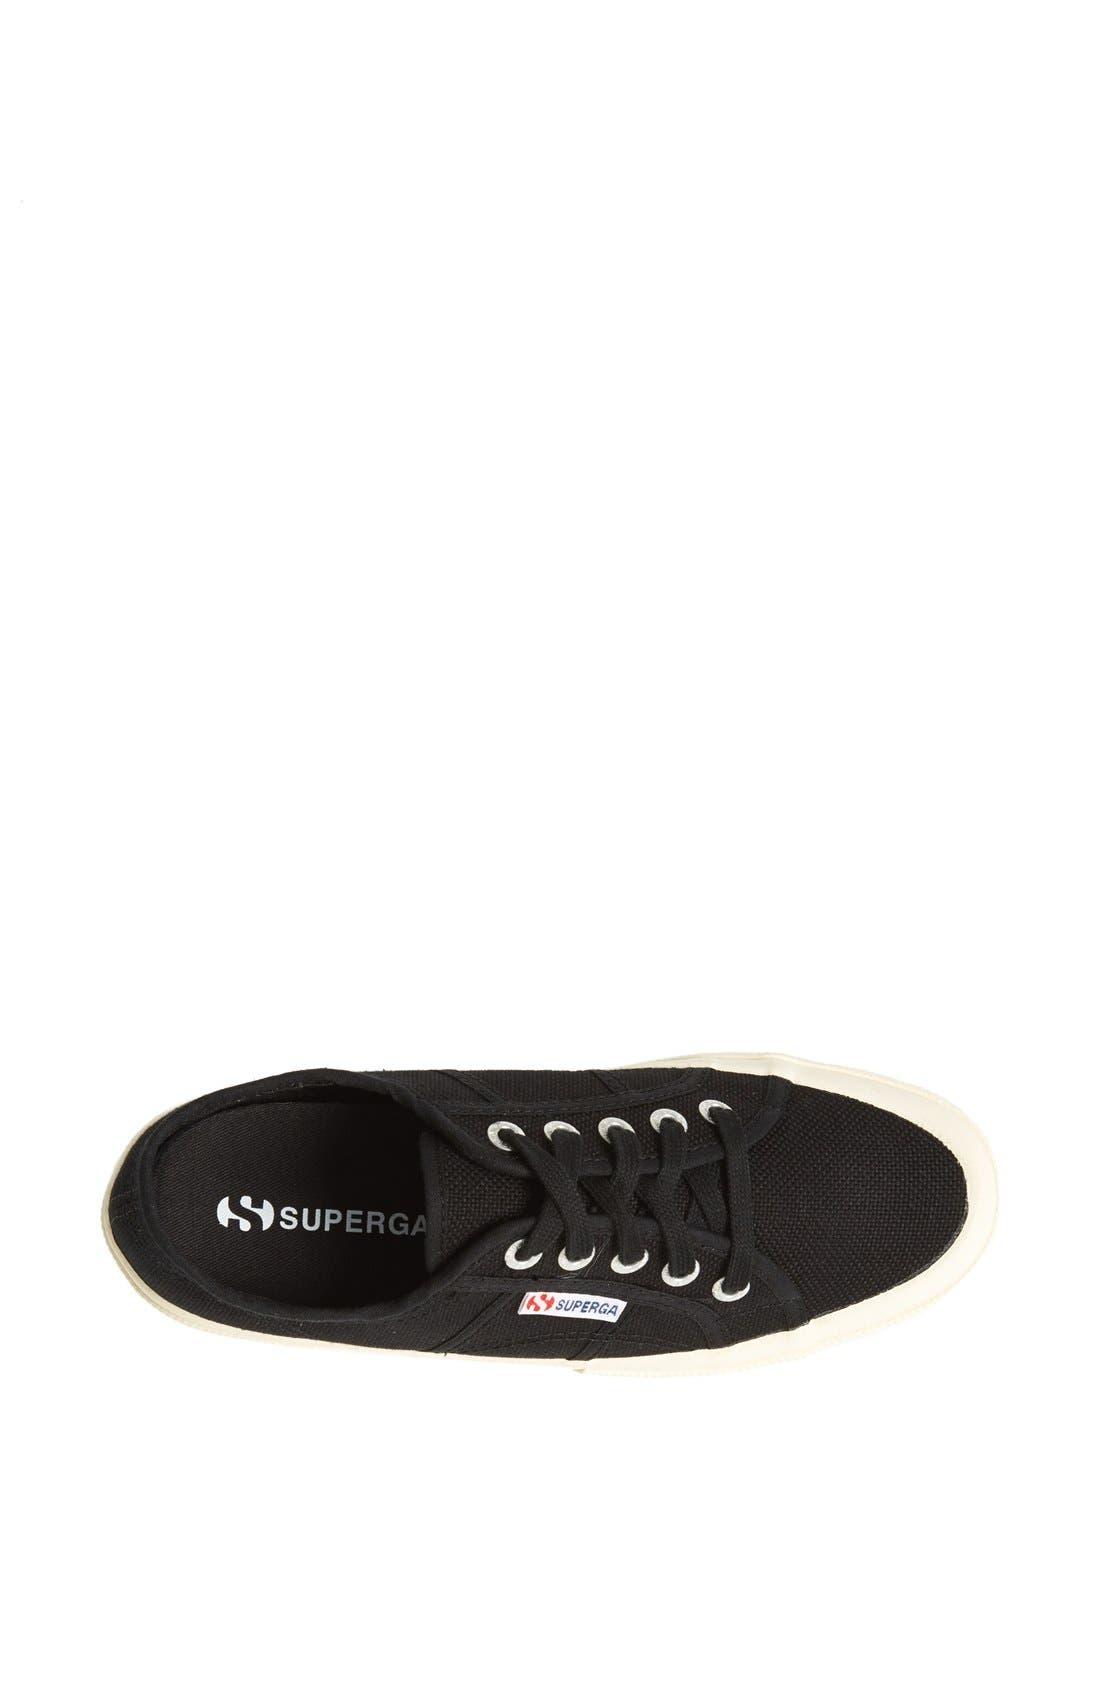 Alternate Image 3  - Superga 'Linea' Wedge Sneaker (Women)